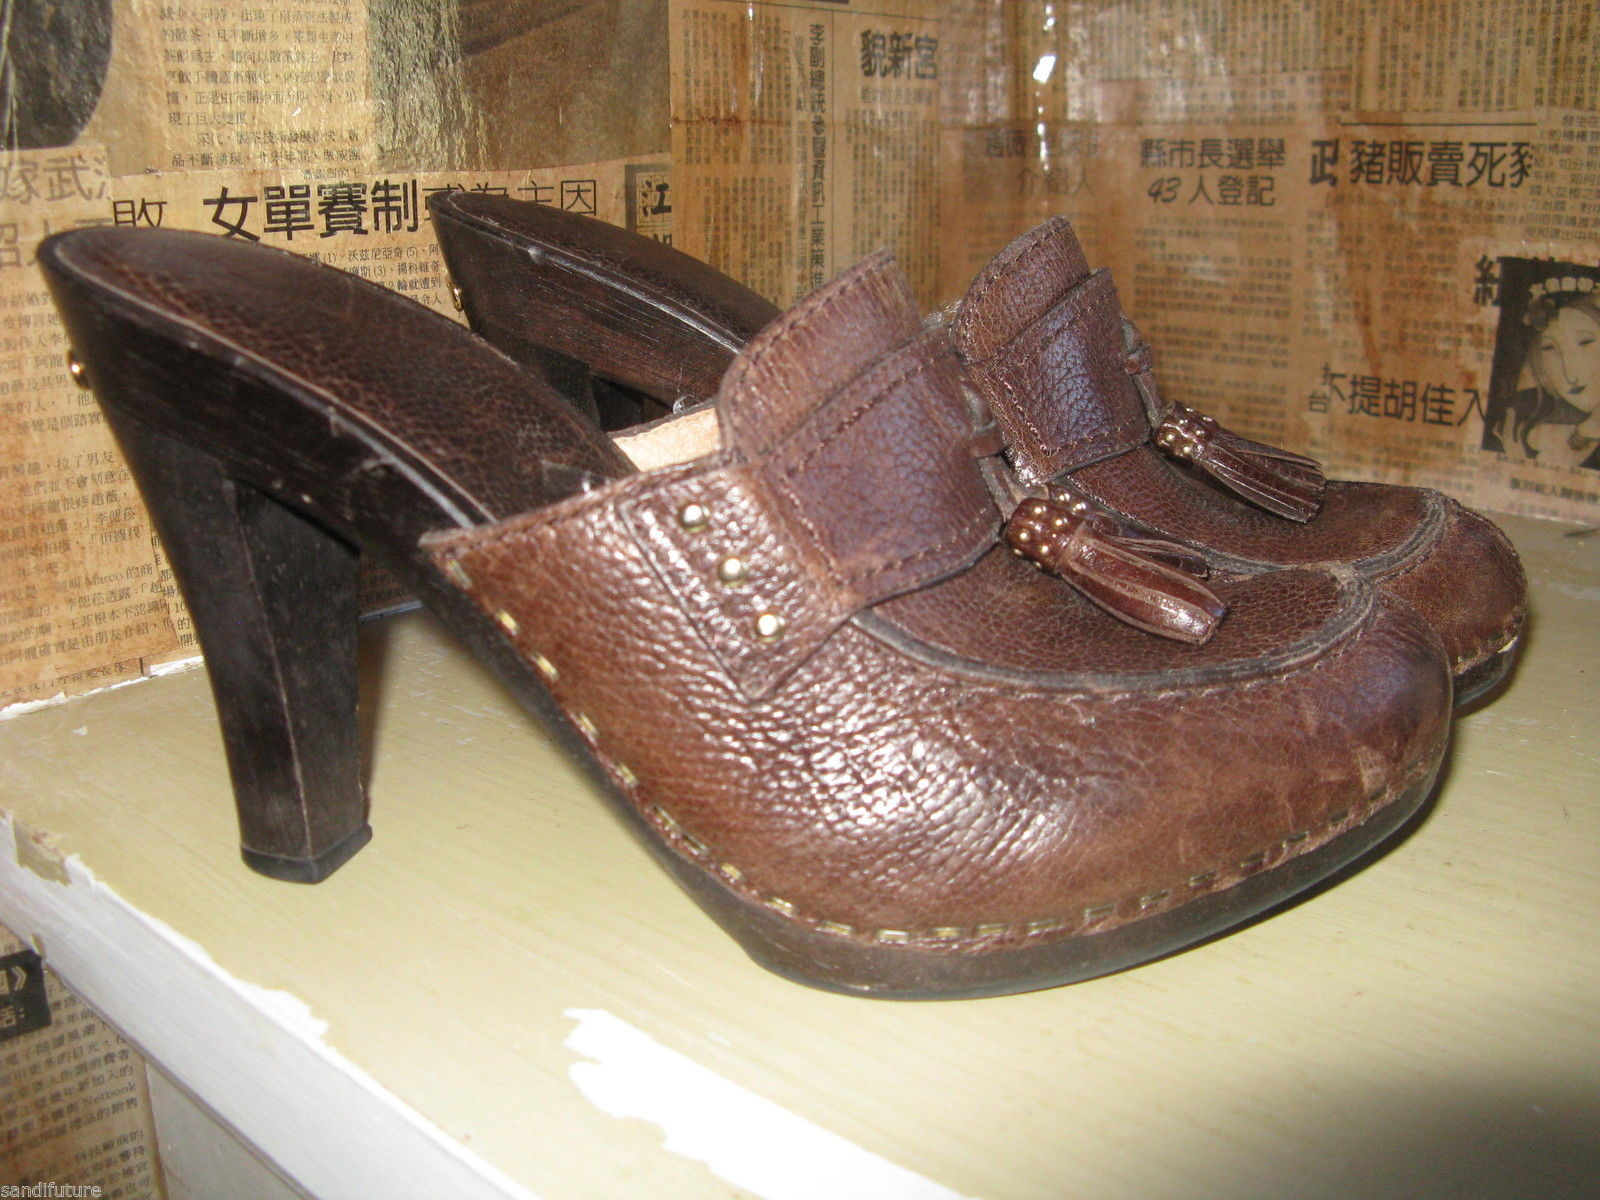 Michael Kors San Antonio platform clog mule wooden tassel shoes 6.5 UK4 36.5